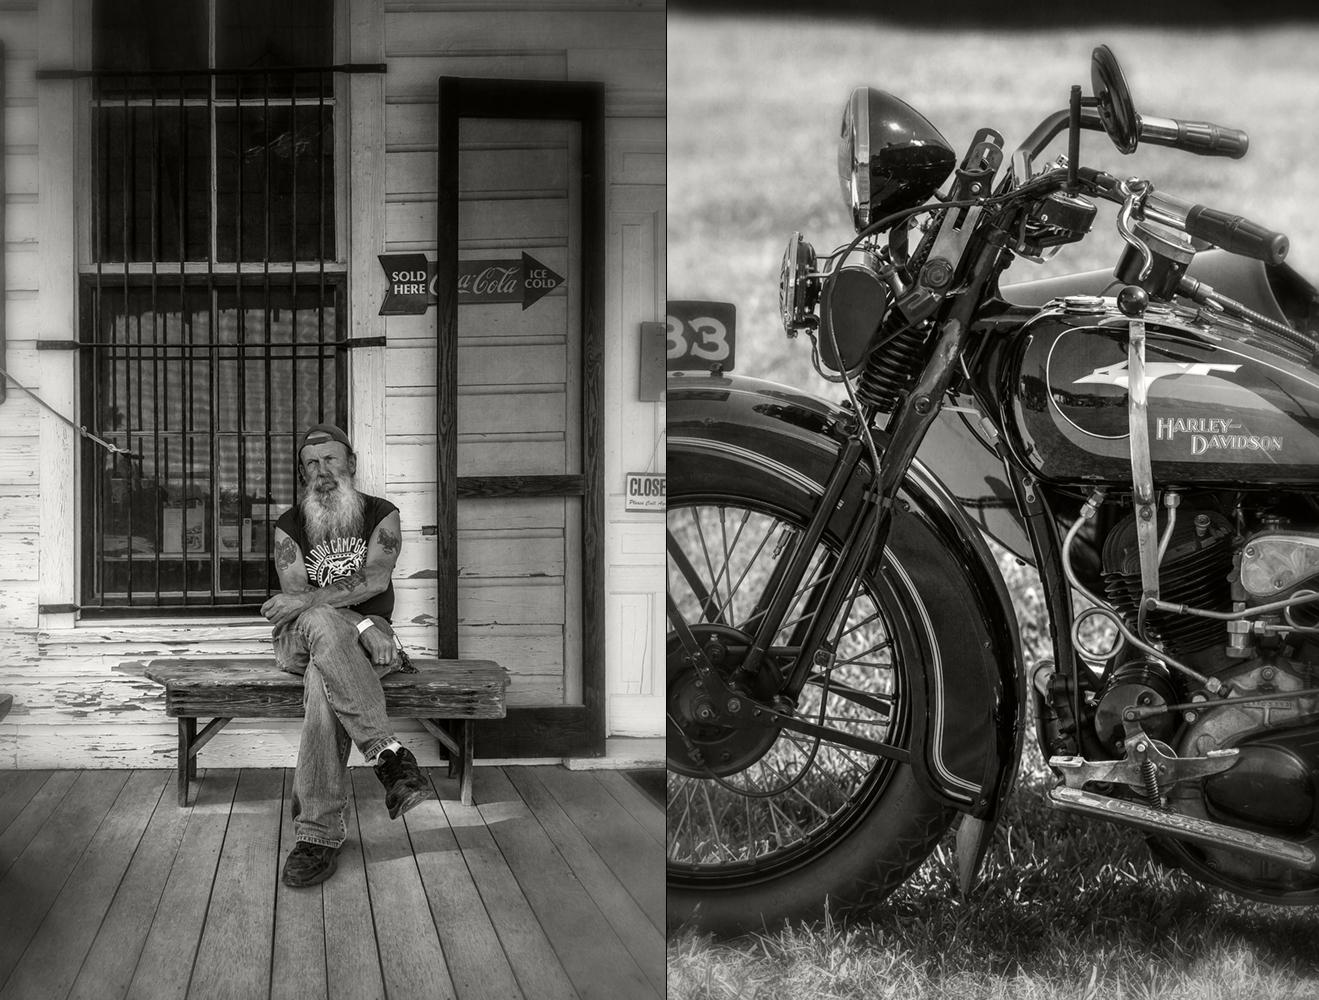 denton_motorcycle meet_2017_group_03